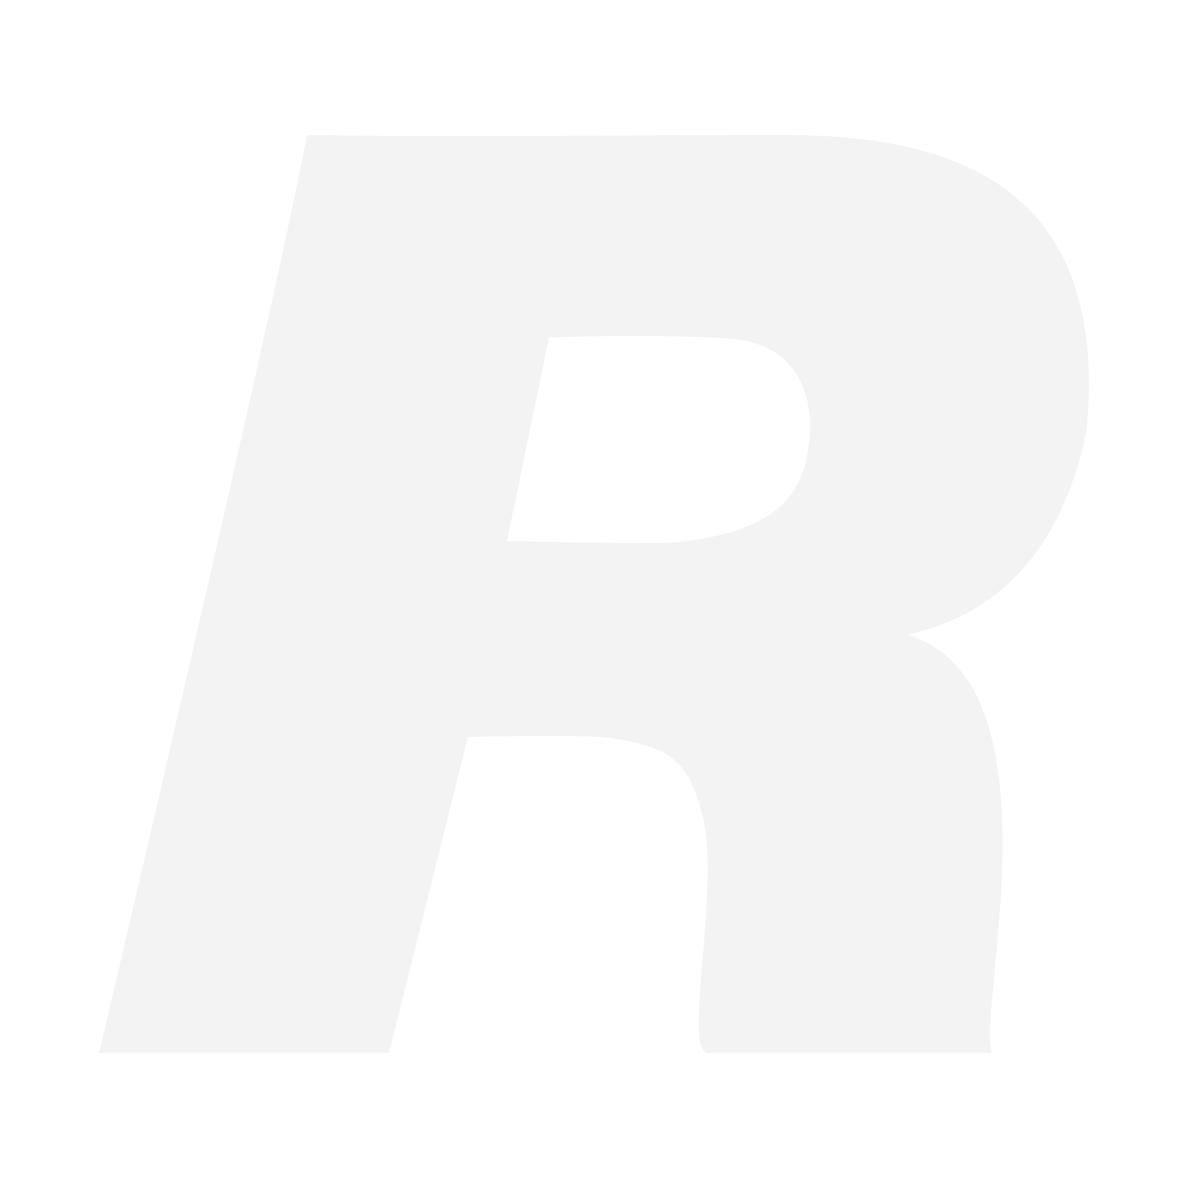 Leica Soft Release Button 8mm, kromi (Leica M)